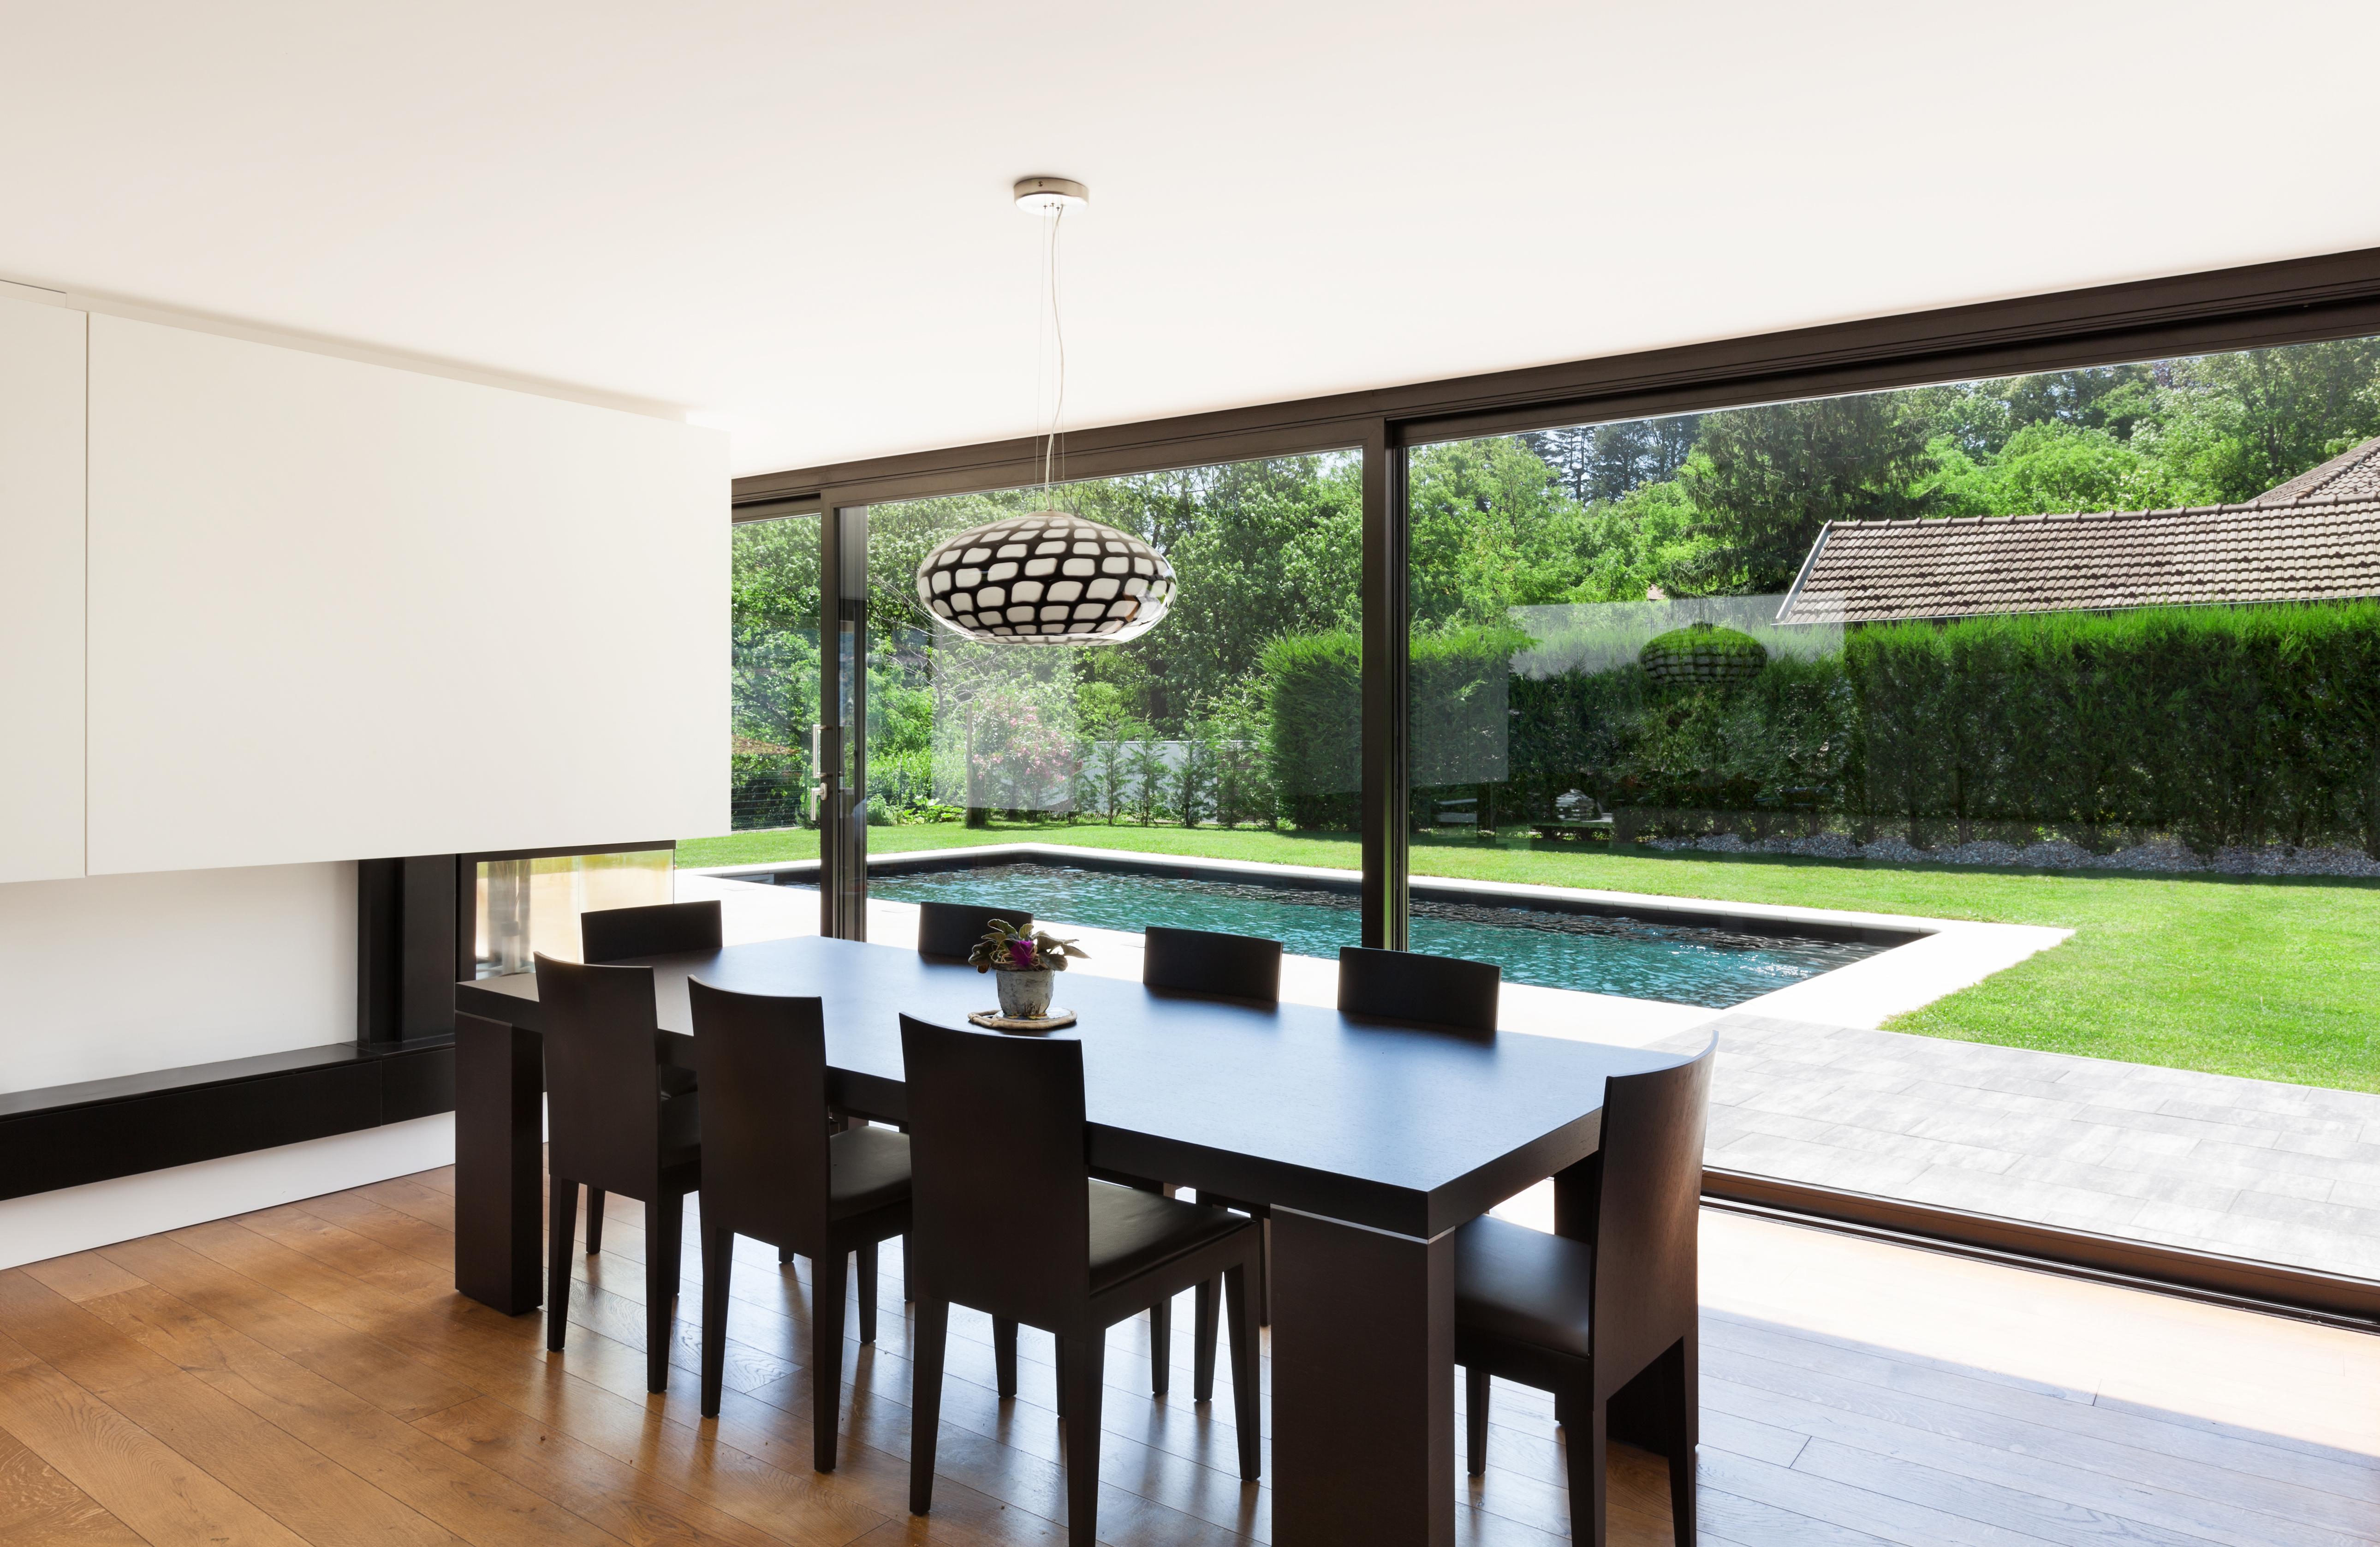 modell anna valburg gmbh. Black Bedroom Furniture Sets. Home Design Ideas